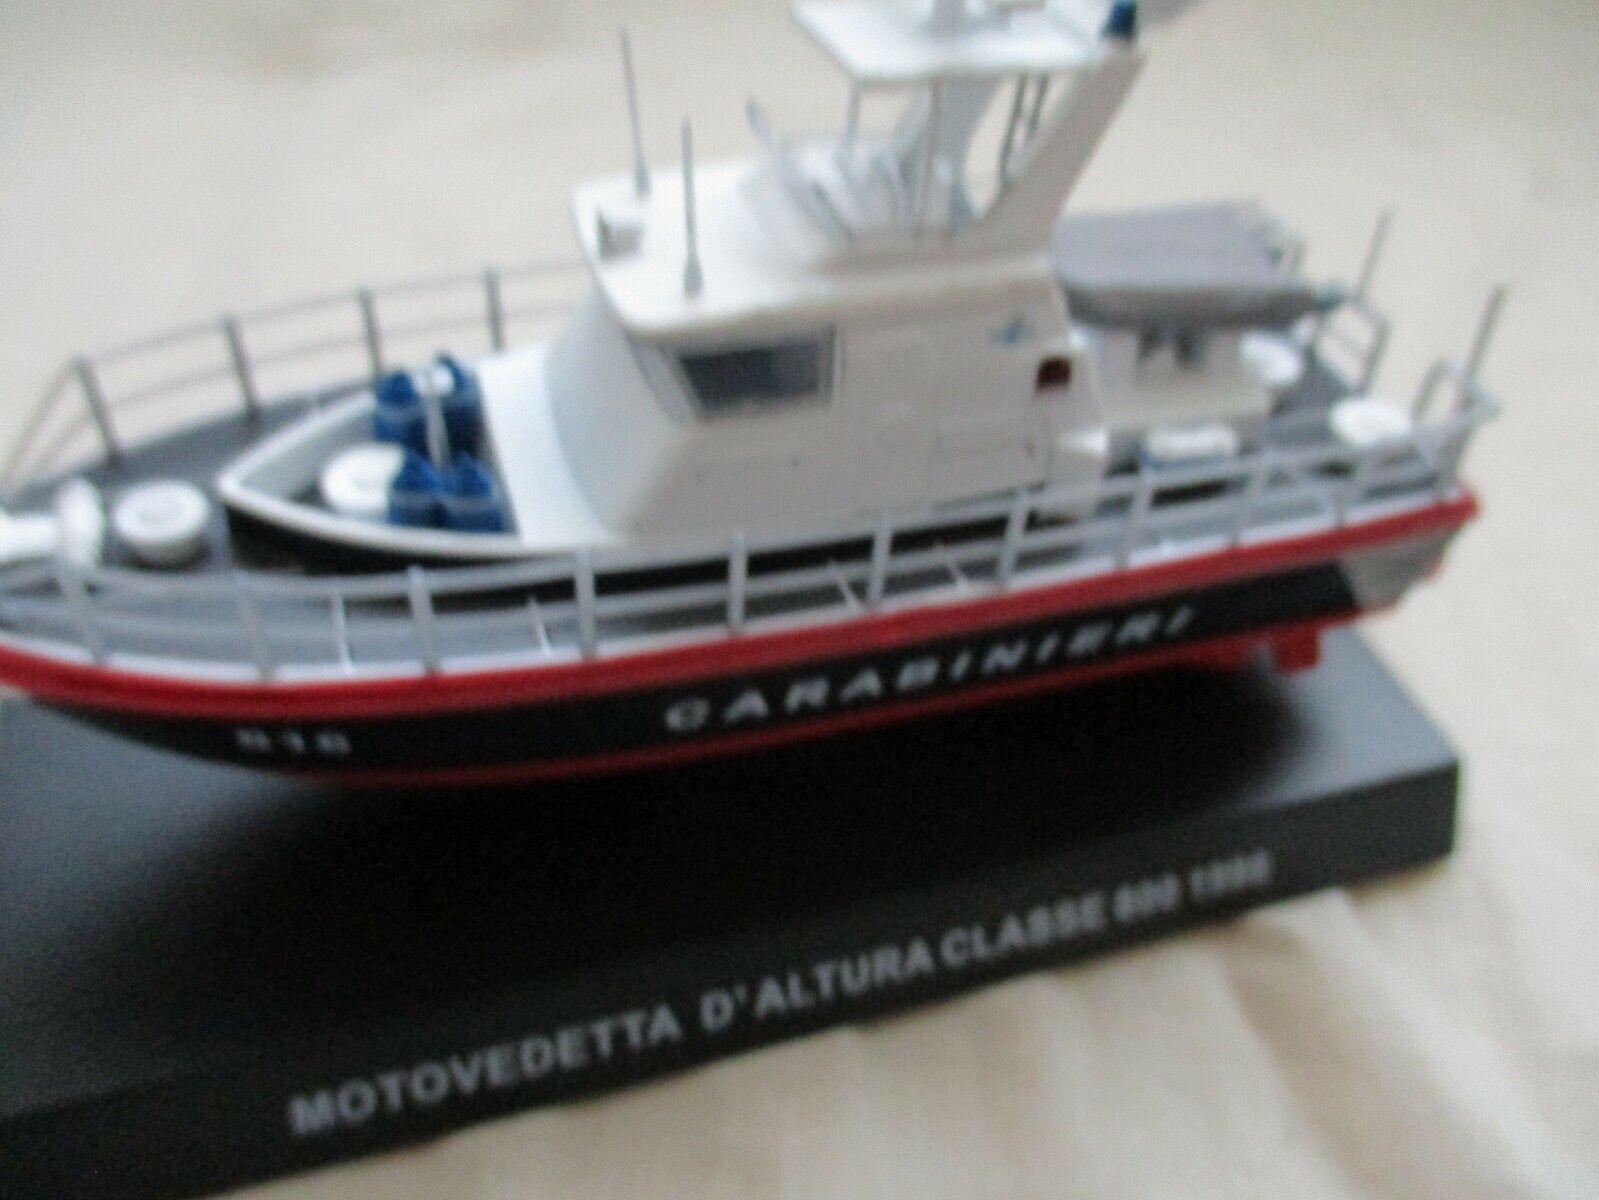 MINIATURE VEDETTE MOTOVEDETTA ALTURA CLASSE 800  CARIBINIERI 1 43° POLICE ITALIE